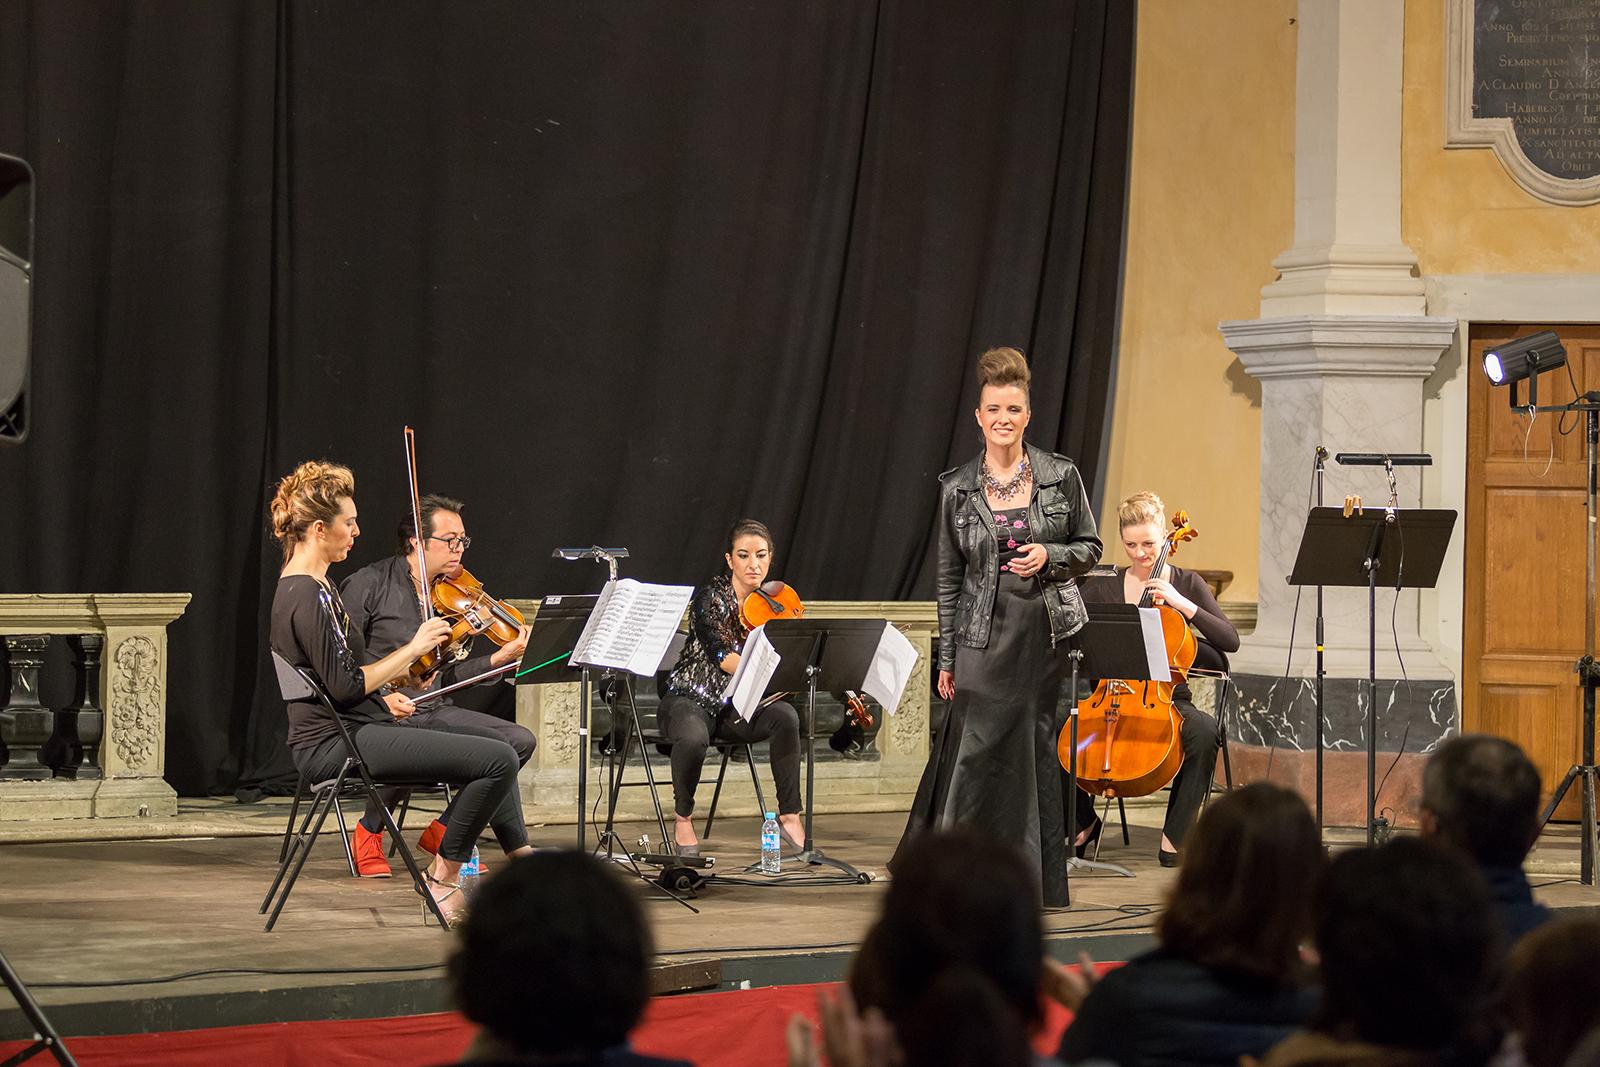 Diana Higbee & le Quatuor Musica